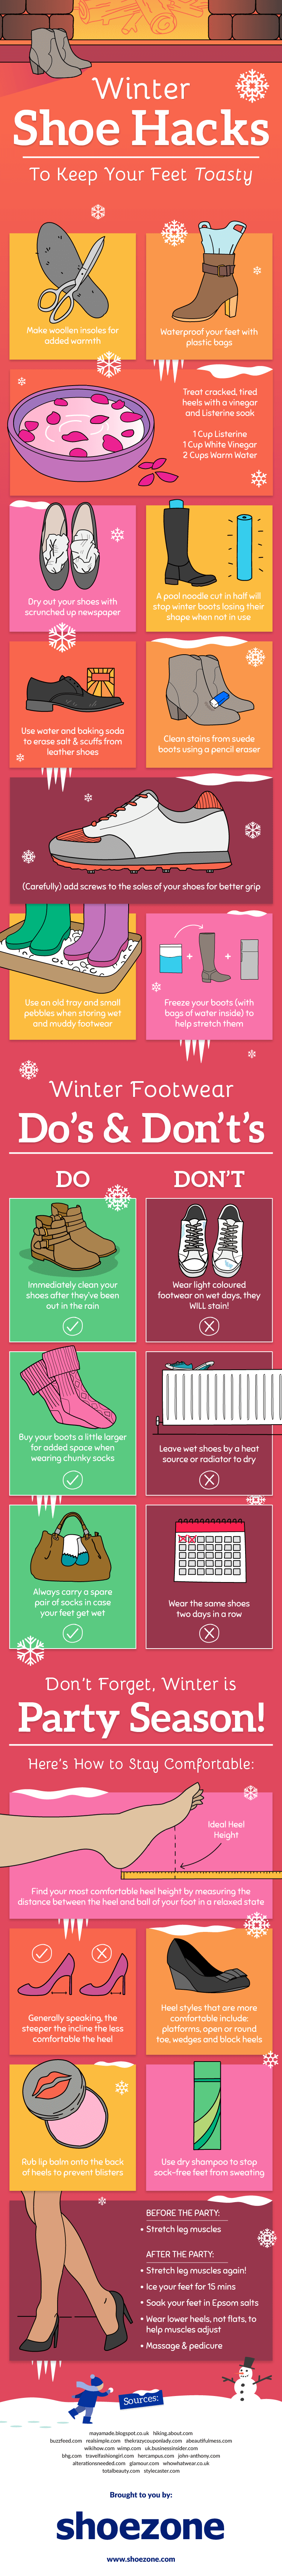 Winter Shoe Hacks to Keep Your Feet Toasty